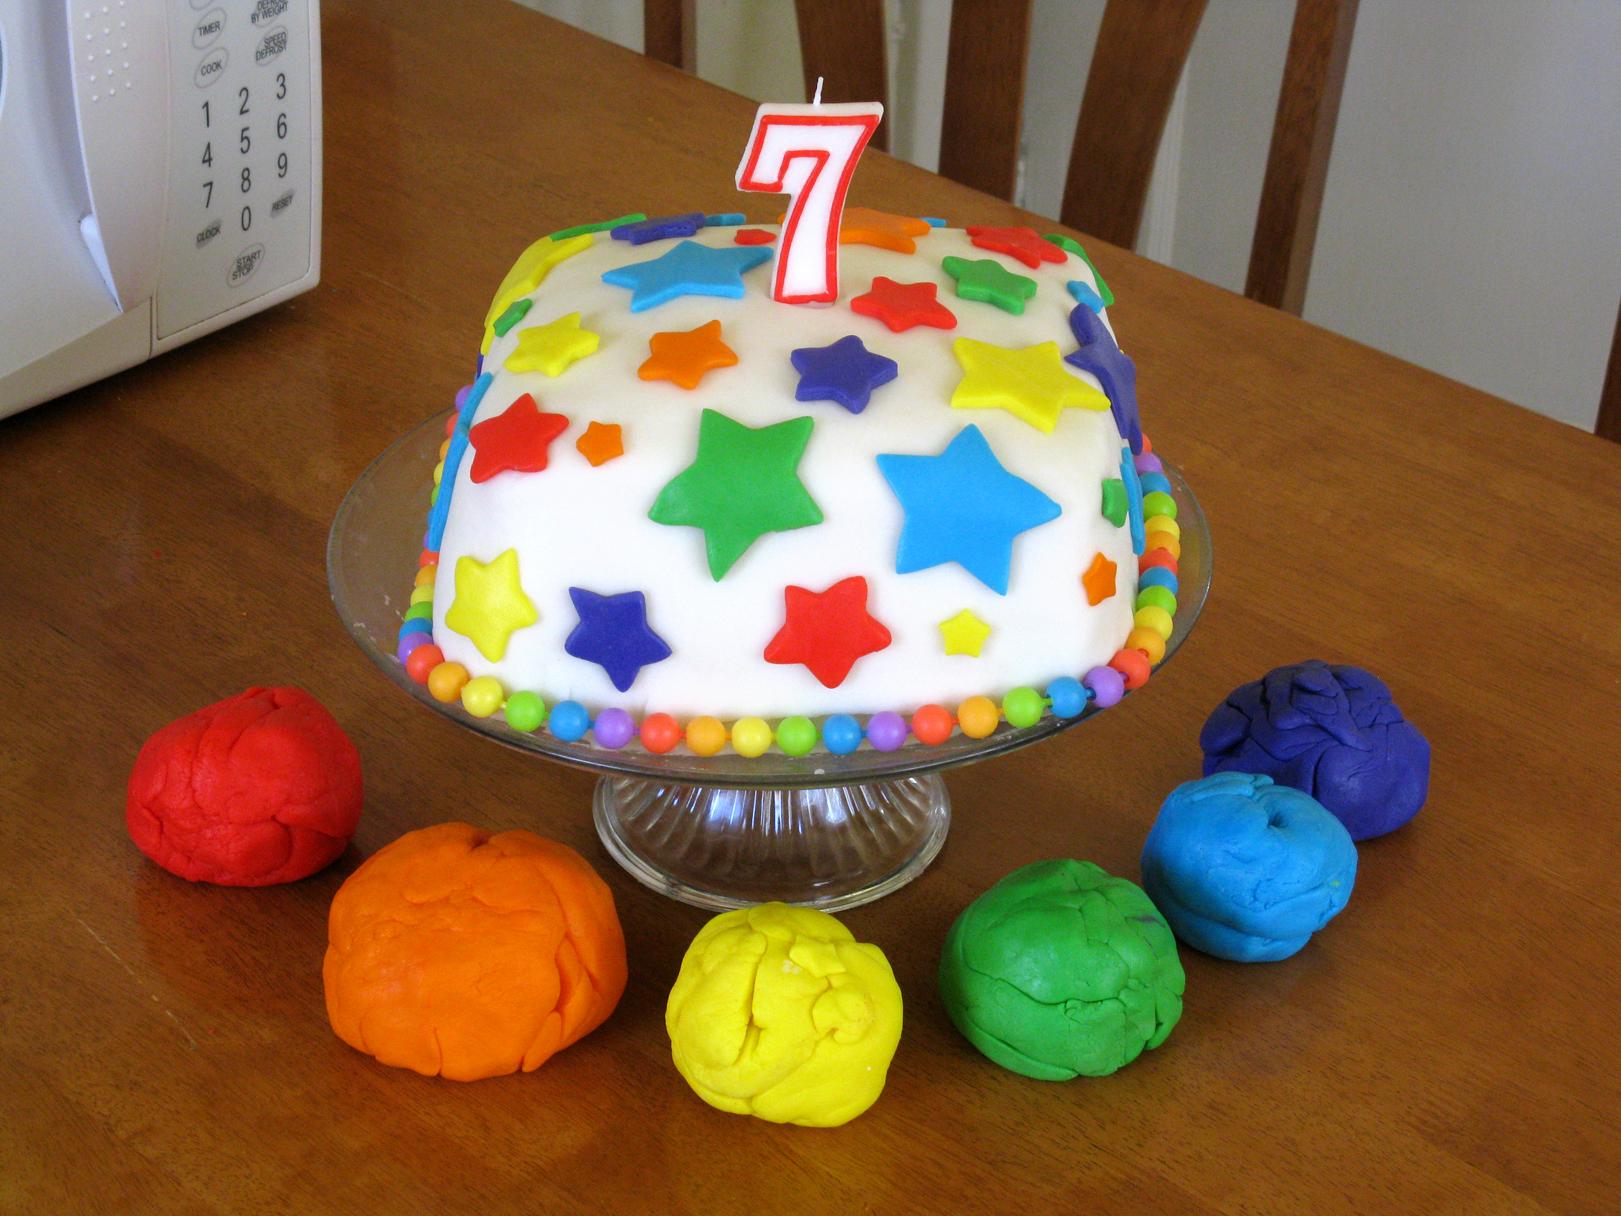 The Beautiful Rainbow Fondant Cake and Rainbow Birthday Party